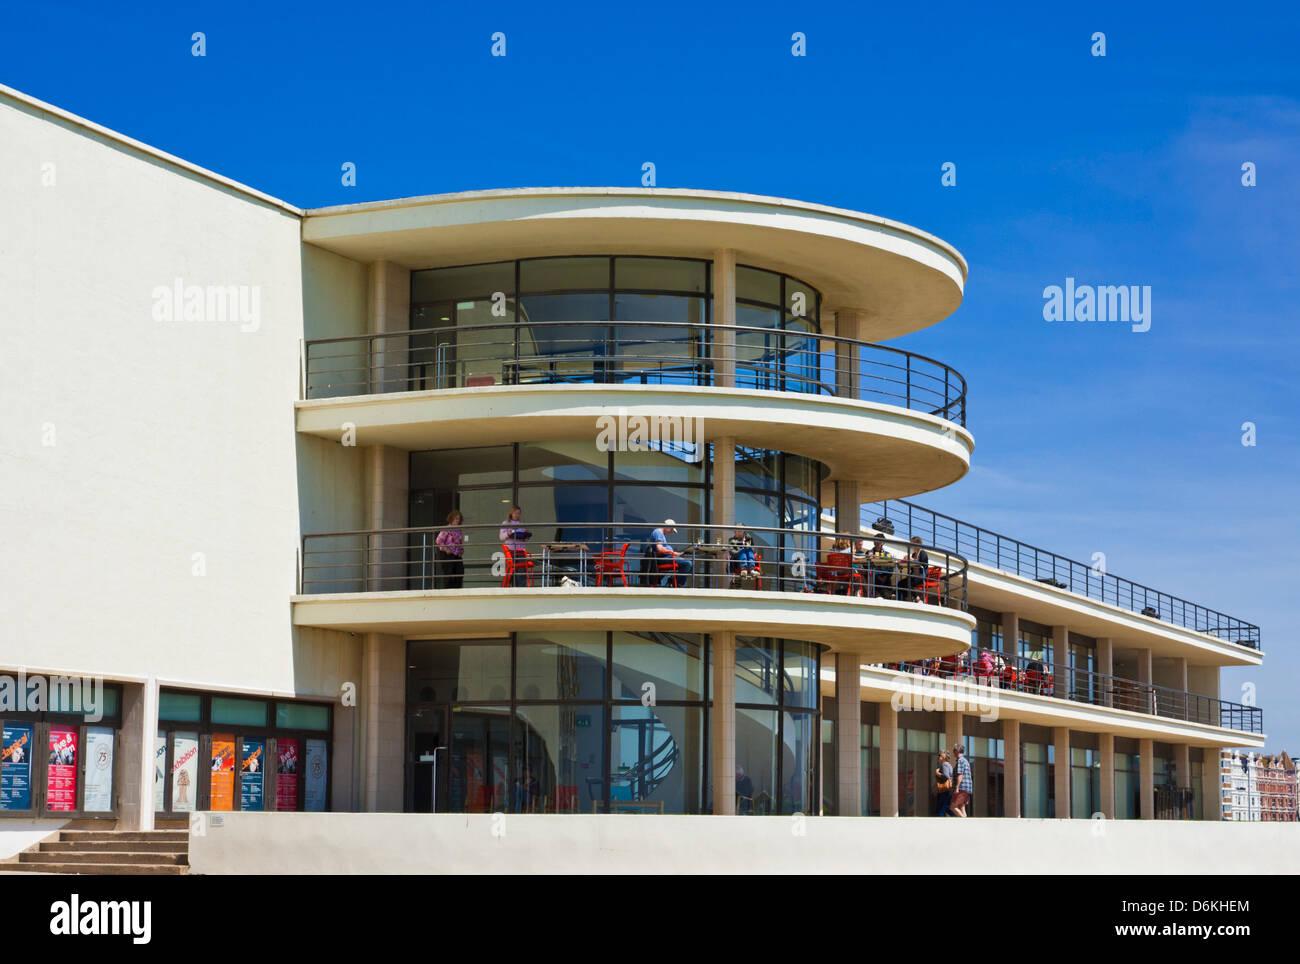 the De La Warr Pavilion, Bexhill on Sea, East Sussex, England, UK, GB, EU, Europe - Stock Image